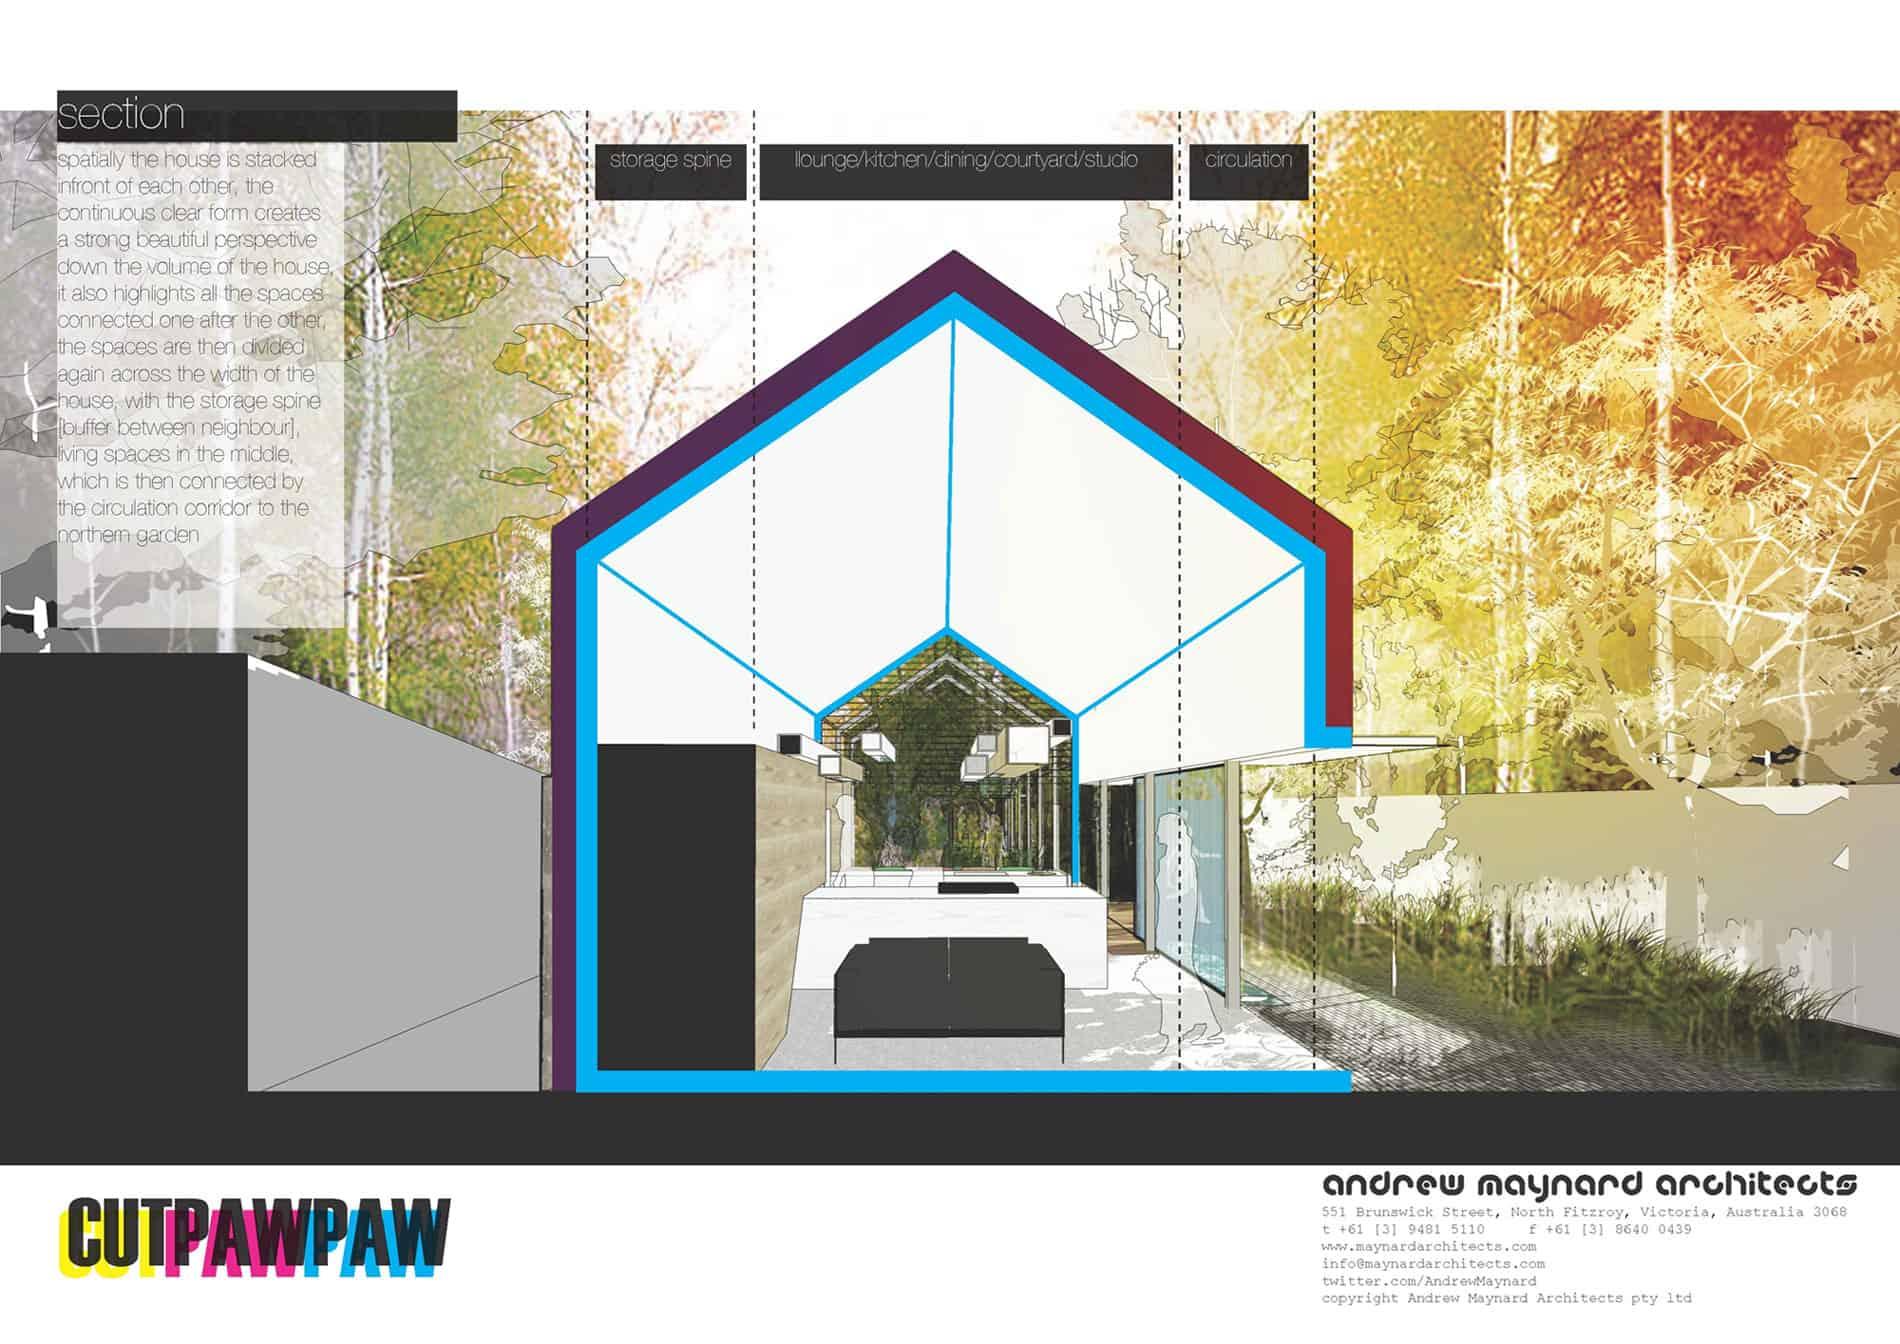 Cut Paw Paw by Andrew Maynard Architects